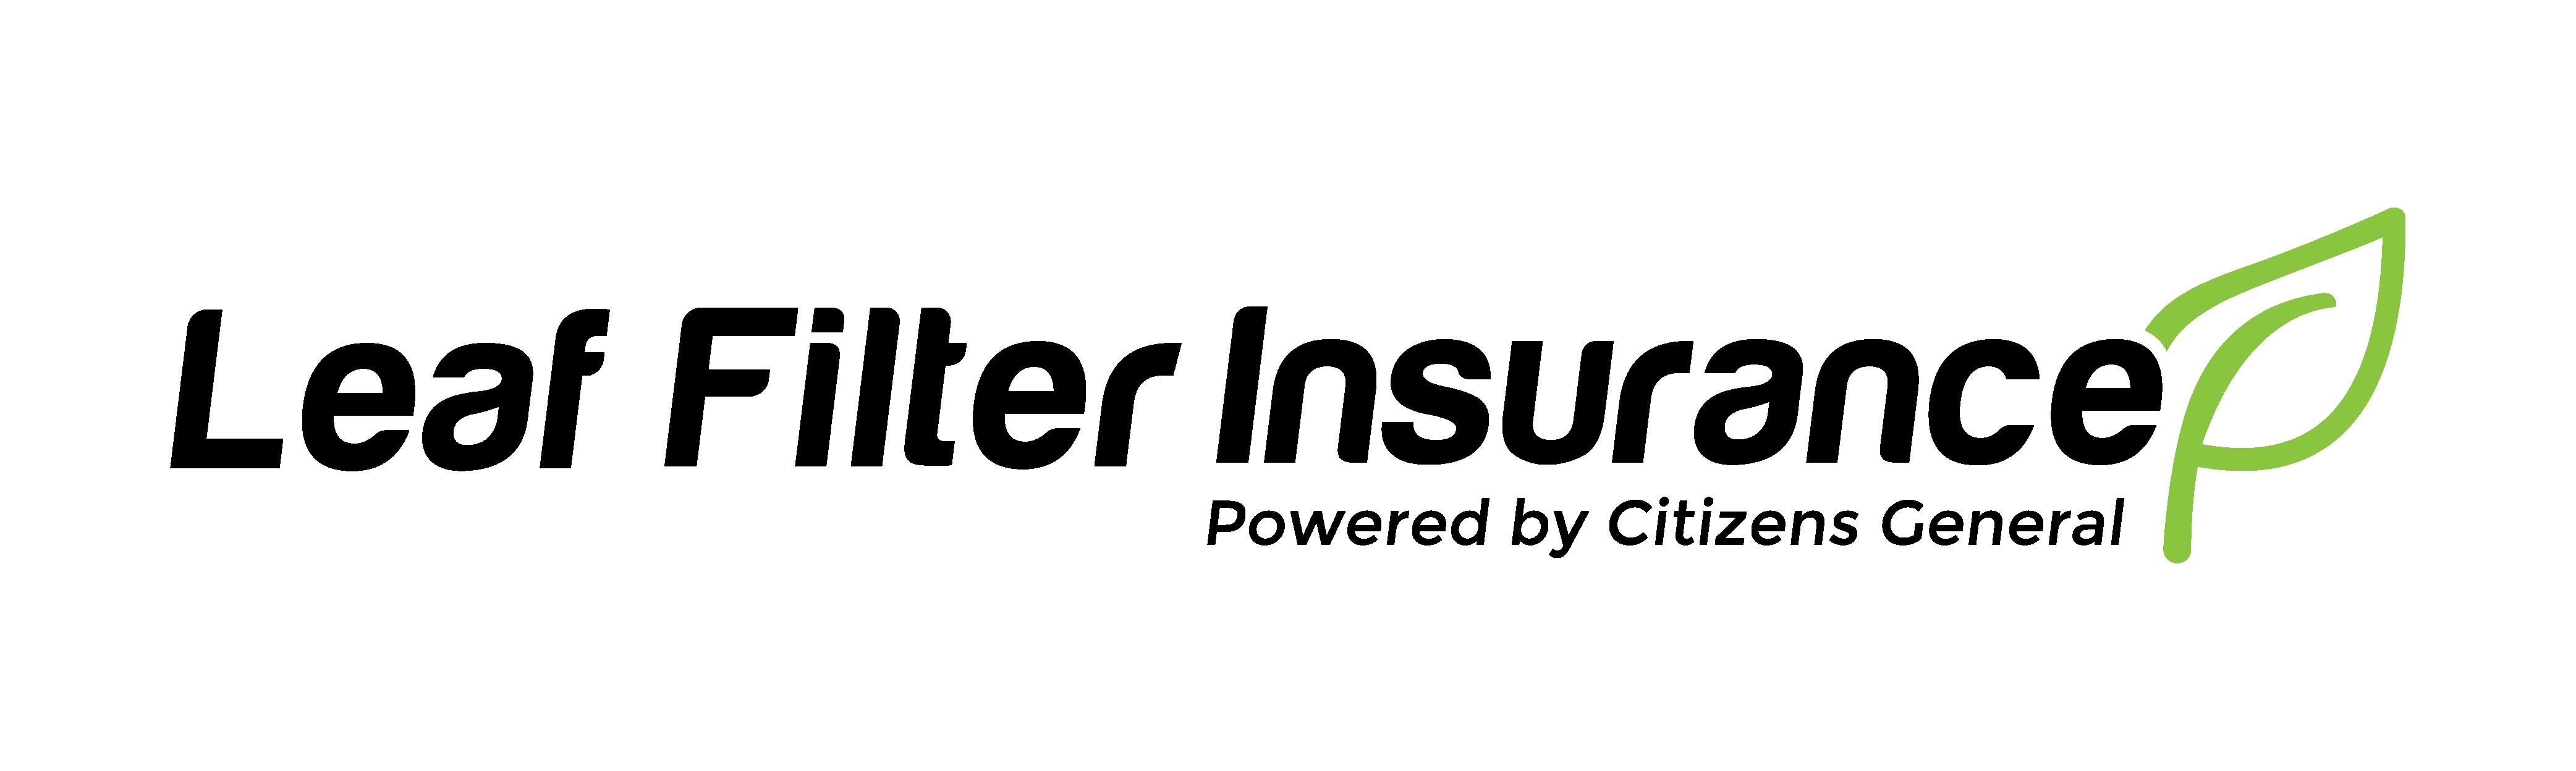 Fresh Logo Redesign